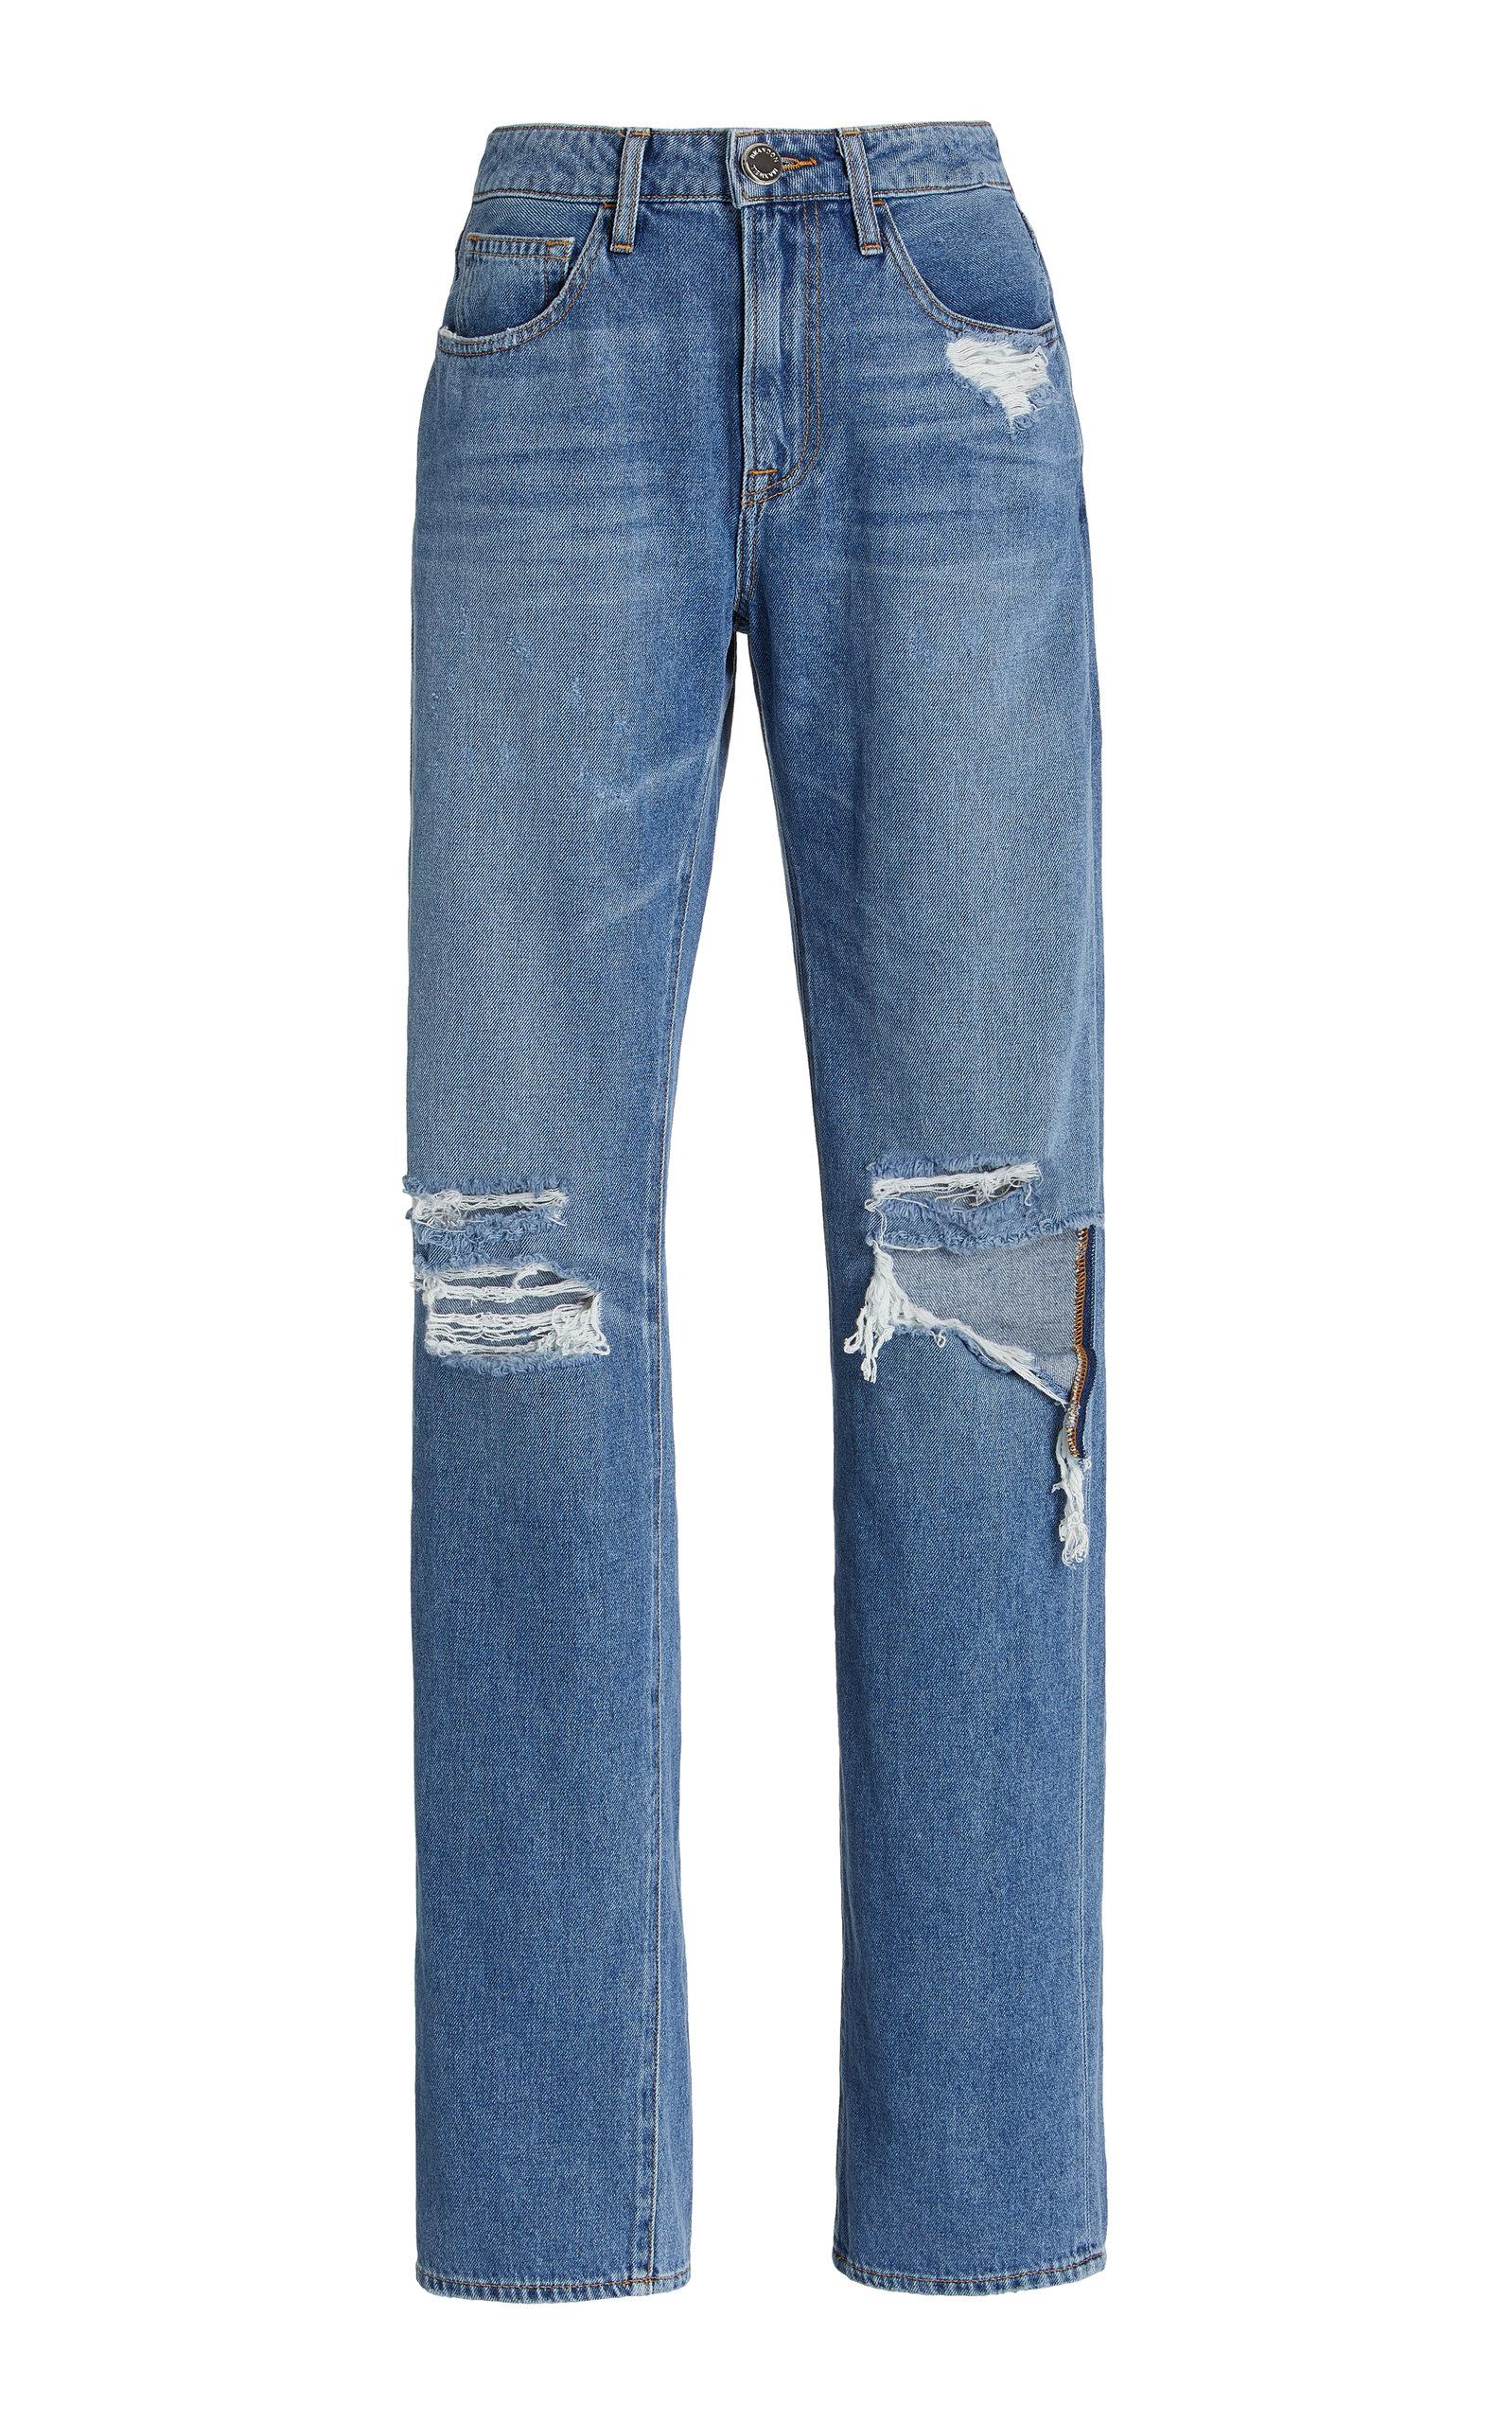 Women's Distressed Rigid High-Rise Boyfriend Jeans